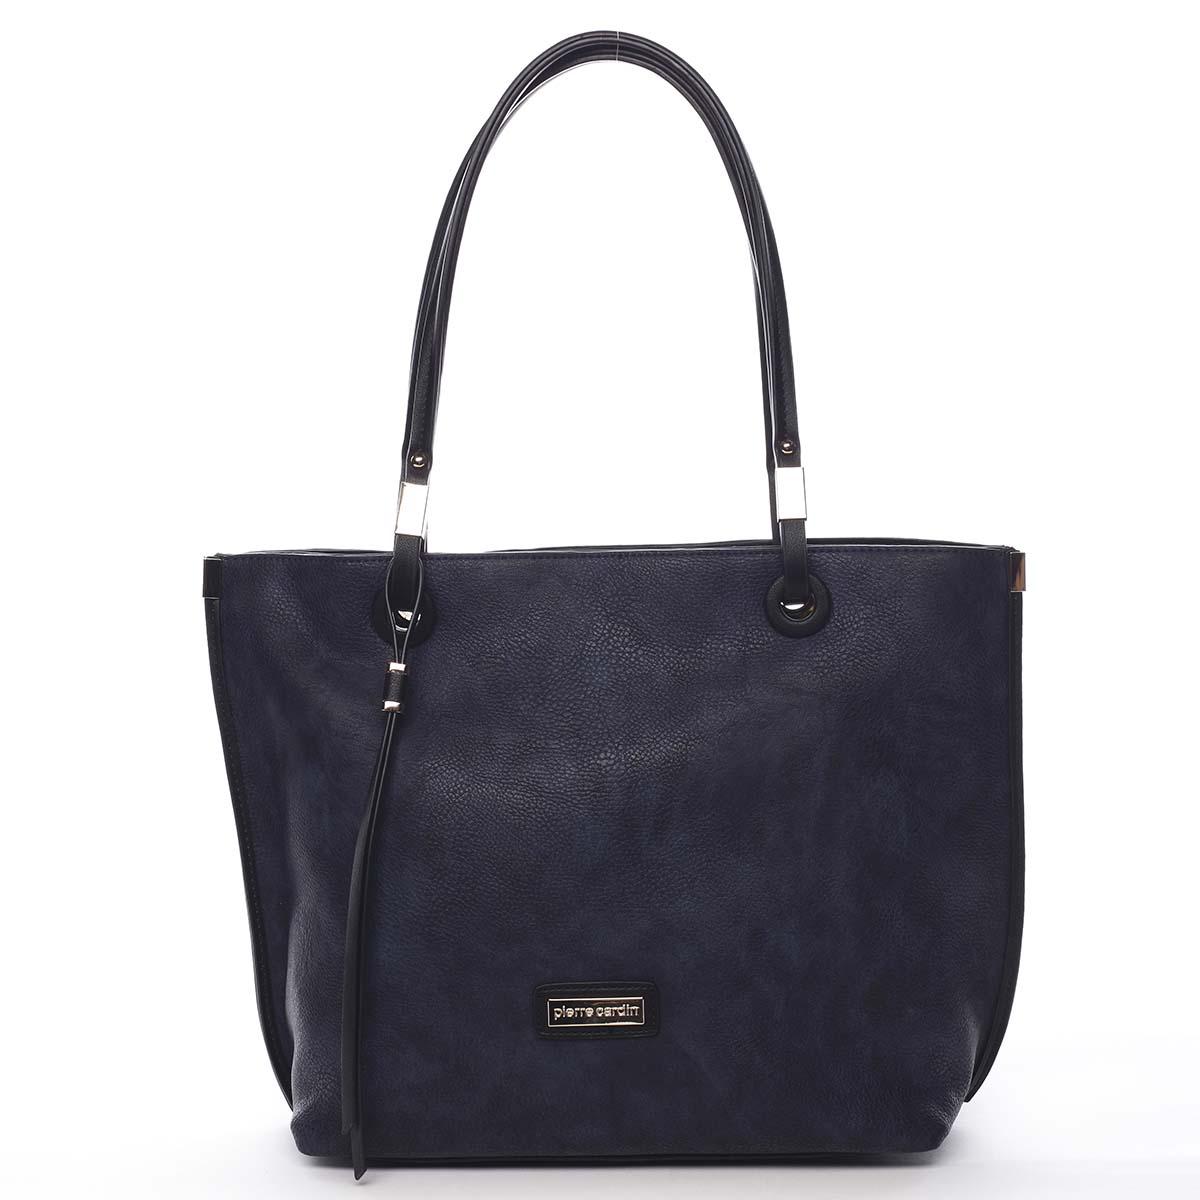 Luxusná dámska kabelka sivo-modrá - Pierre Cardin Comtesa farebná